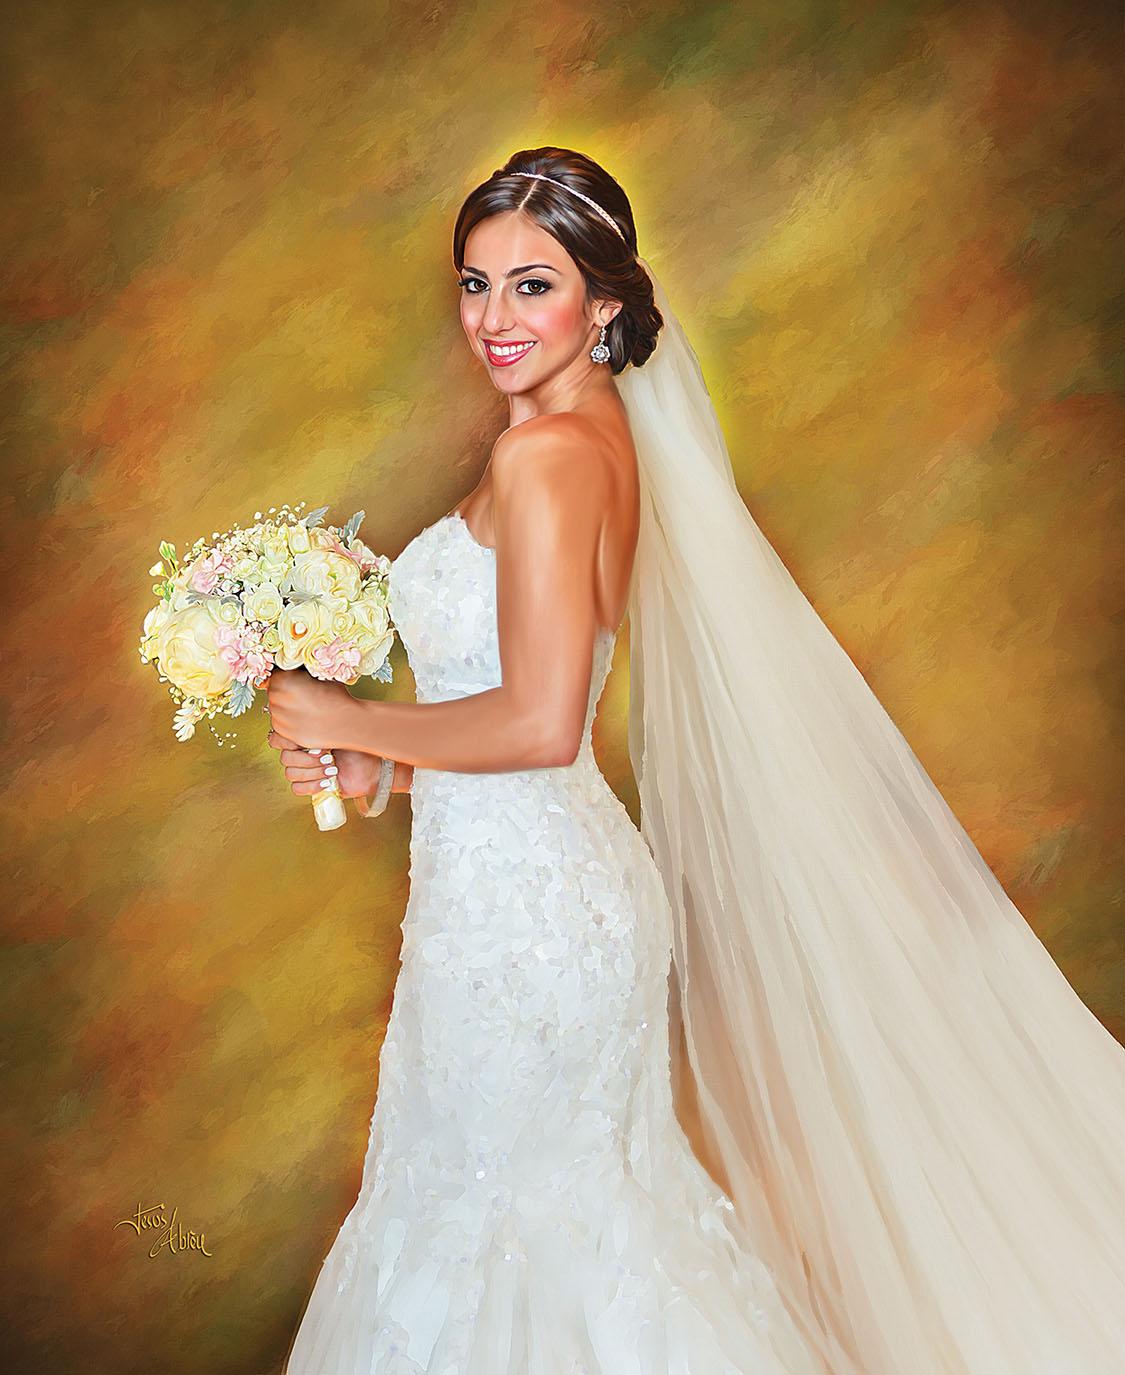 Jacky-weddingf